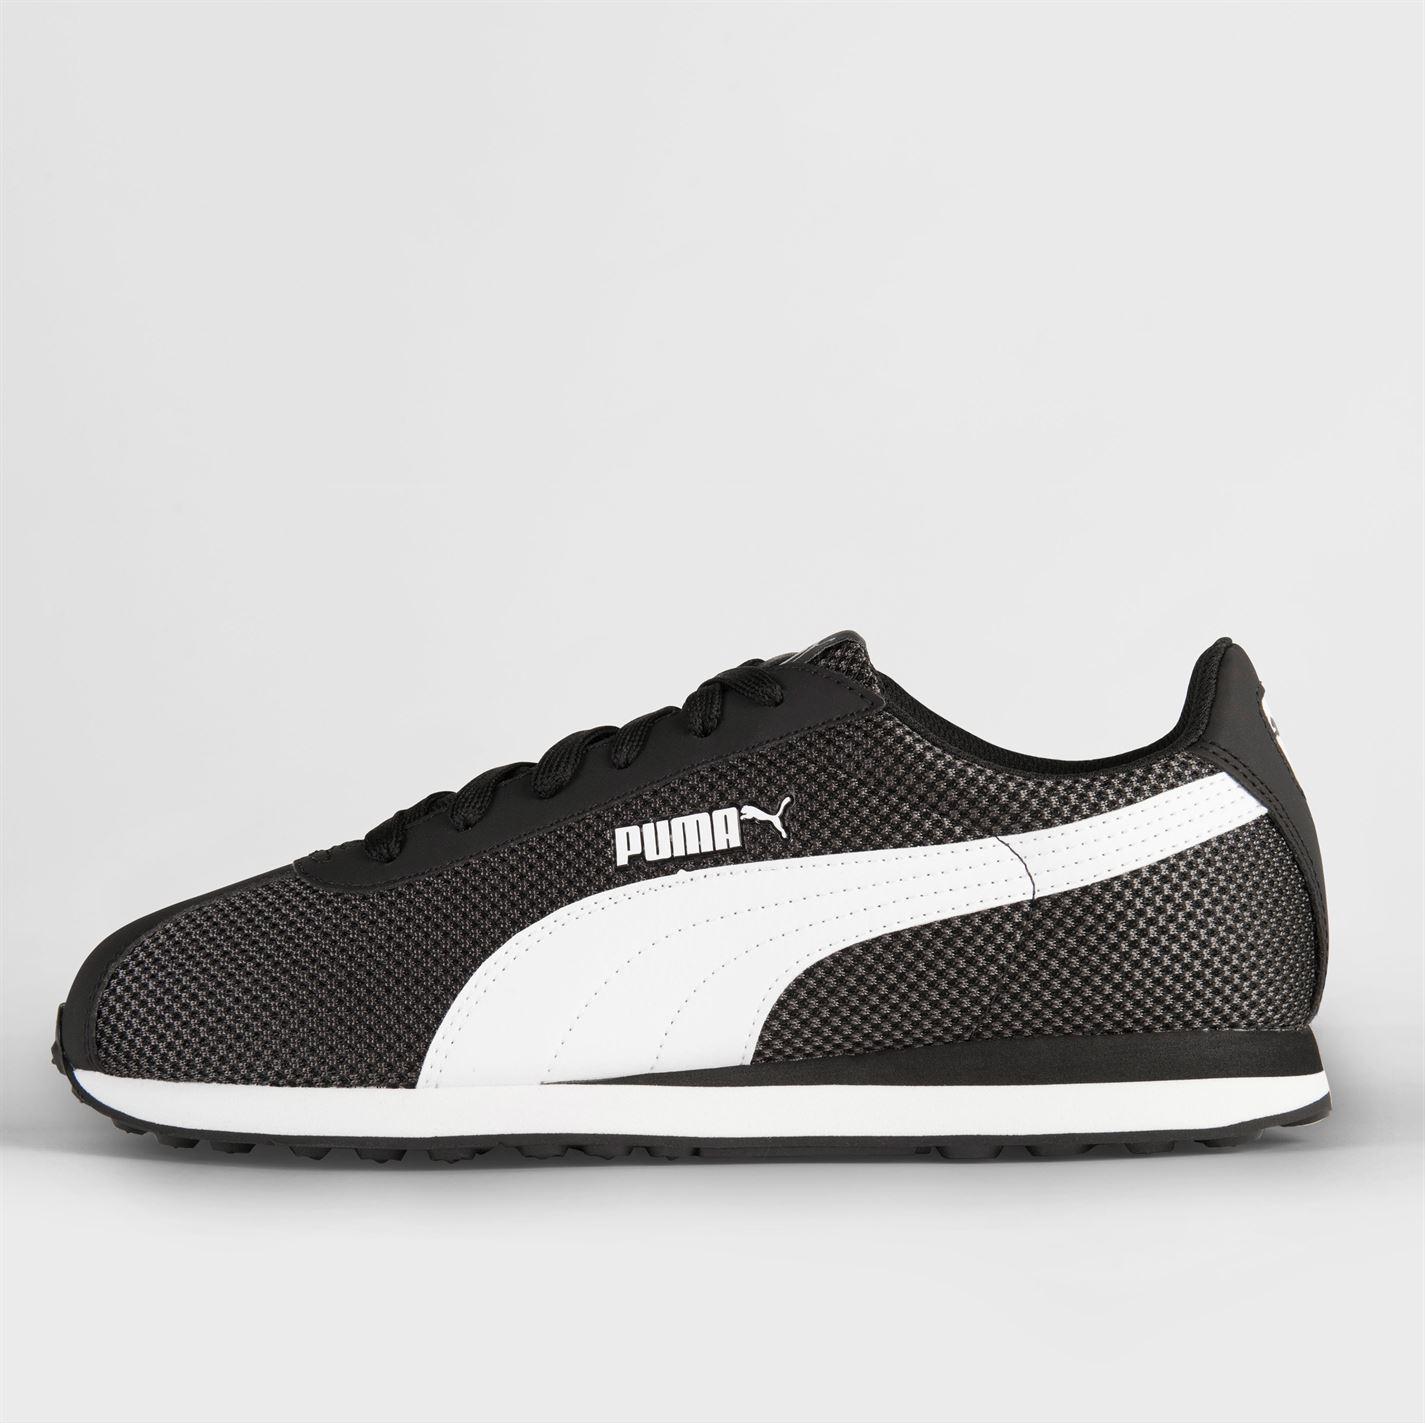 Black White Puma Turin Mesh Uomo Scarpe da ginnastica